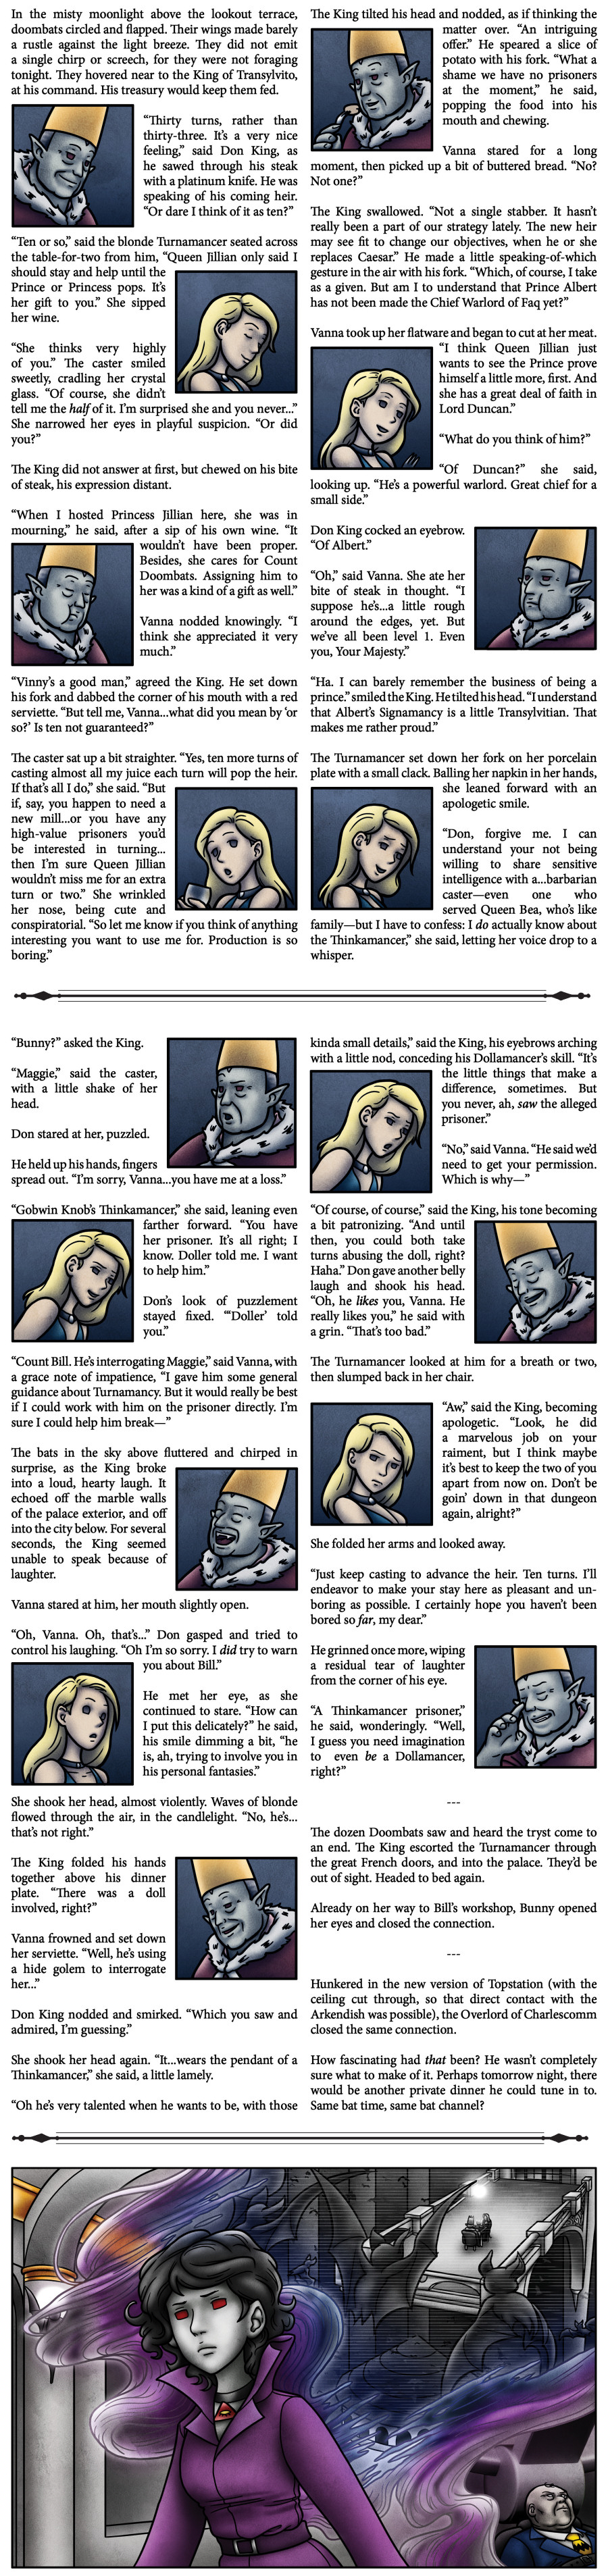 Comic - Book 4 - Page 19